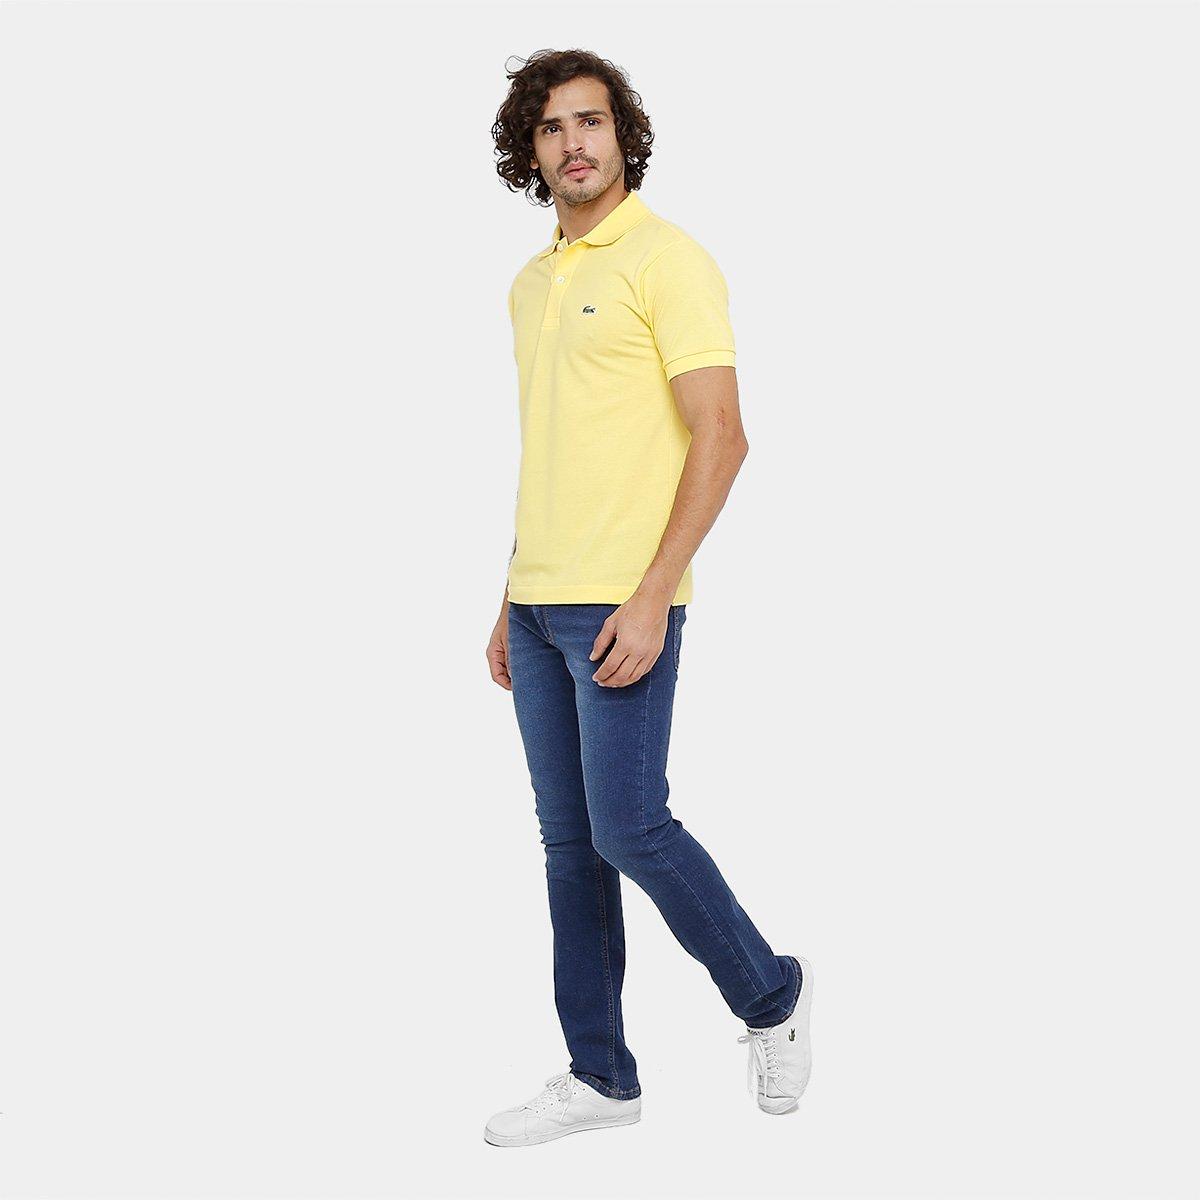 Camisa Polo Lacoste Piquet Original Fit Masculina - Amarelo Claro ... 19c9763f1e2de